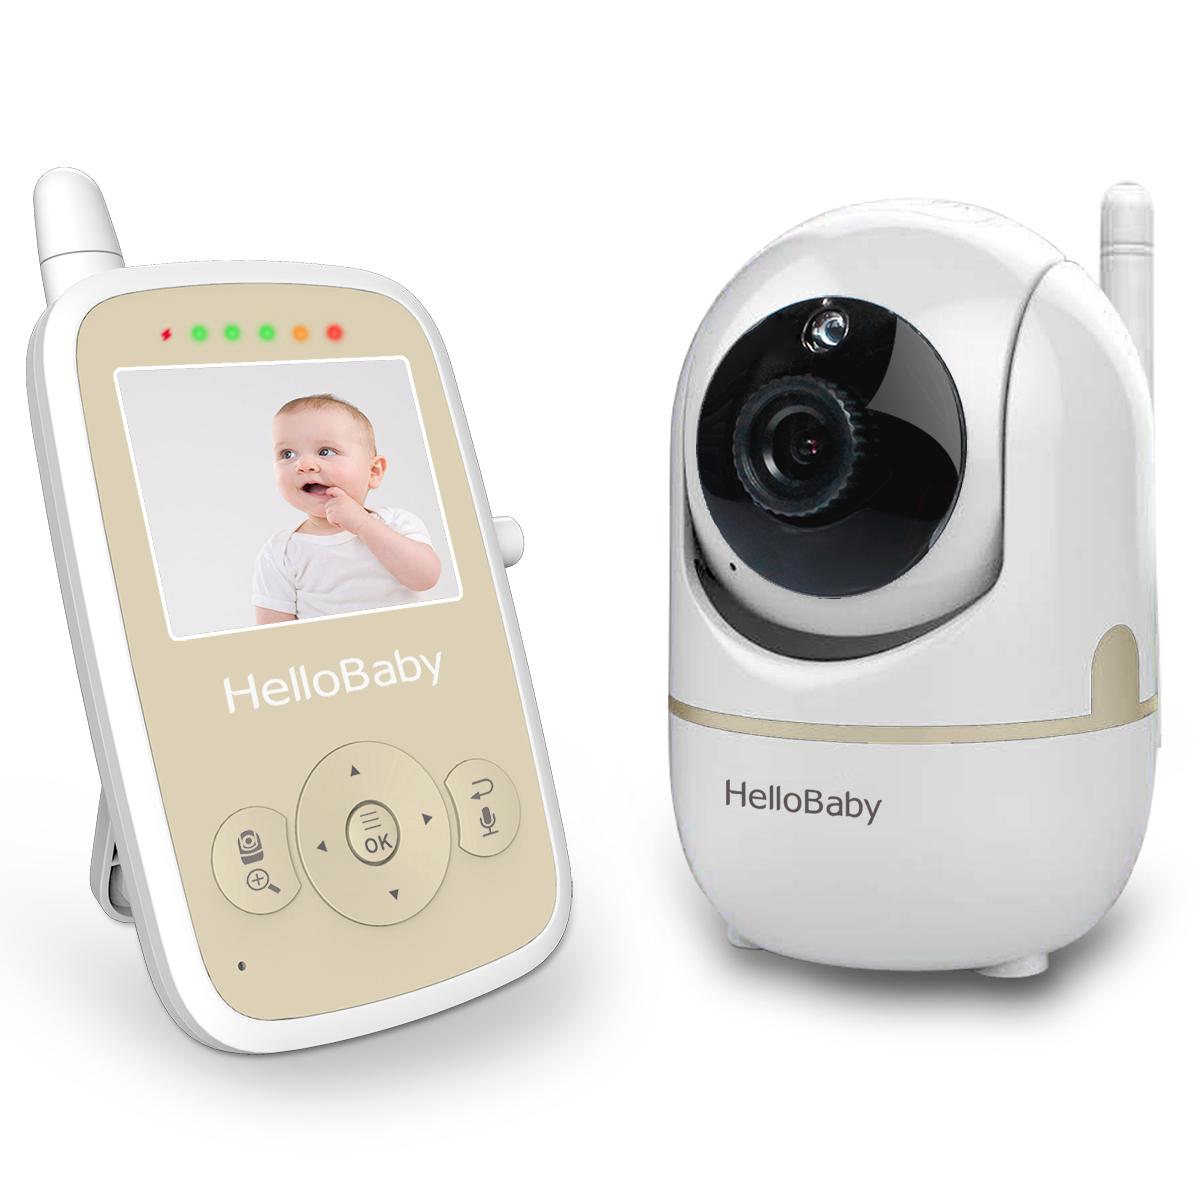 Купить Видеоняня HelloBaby HB248